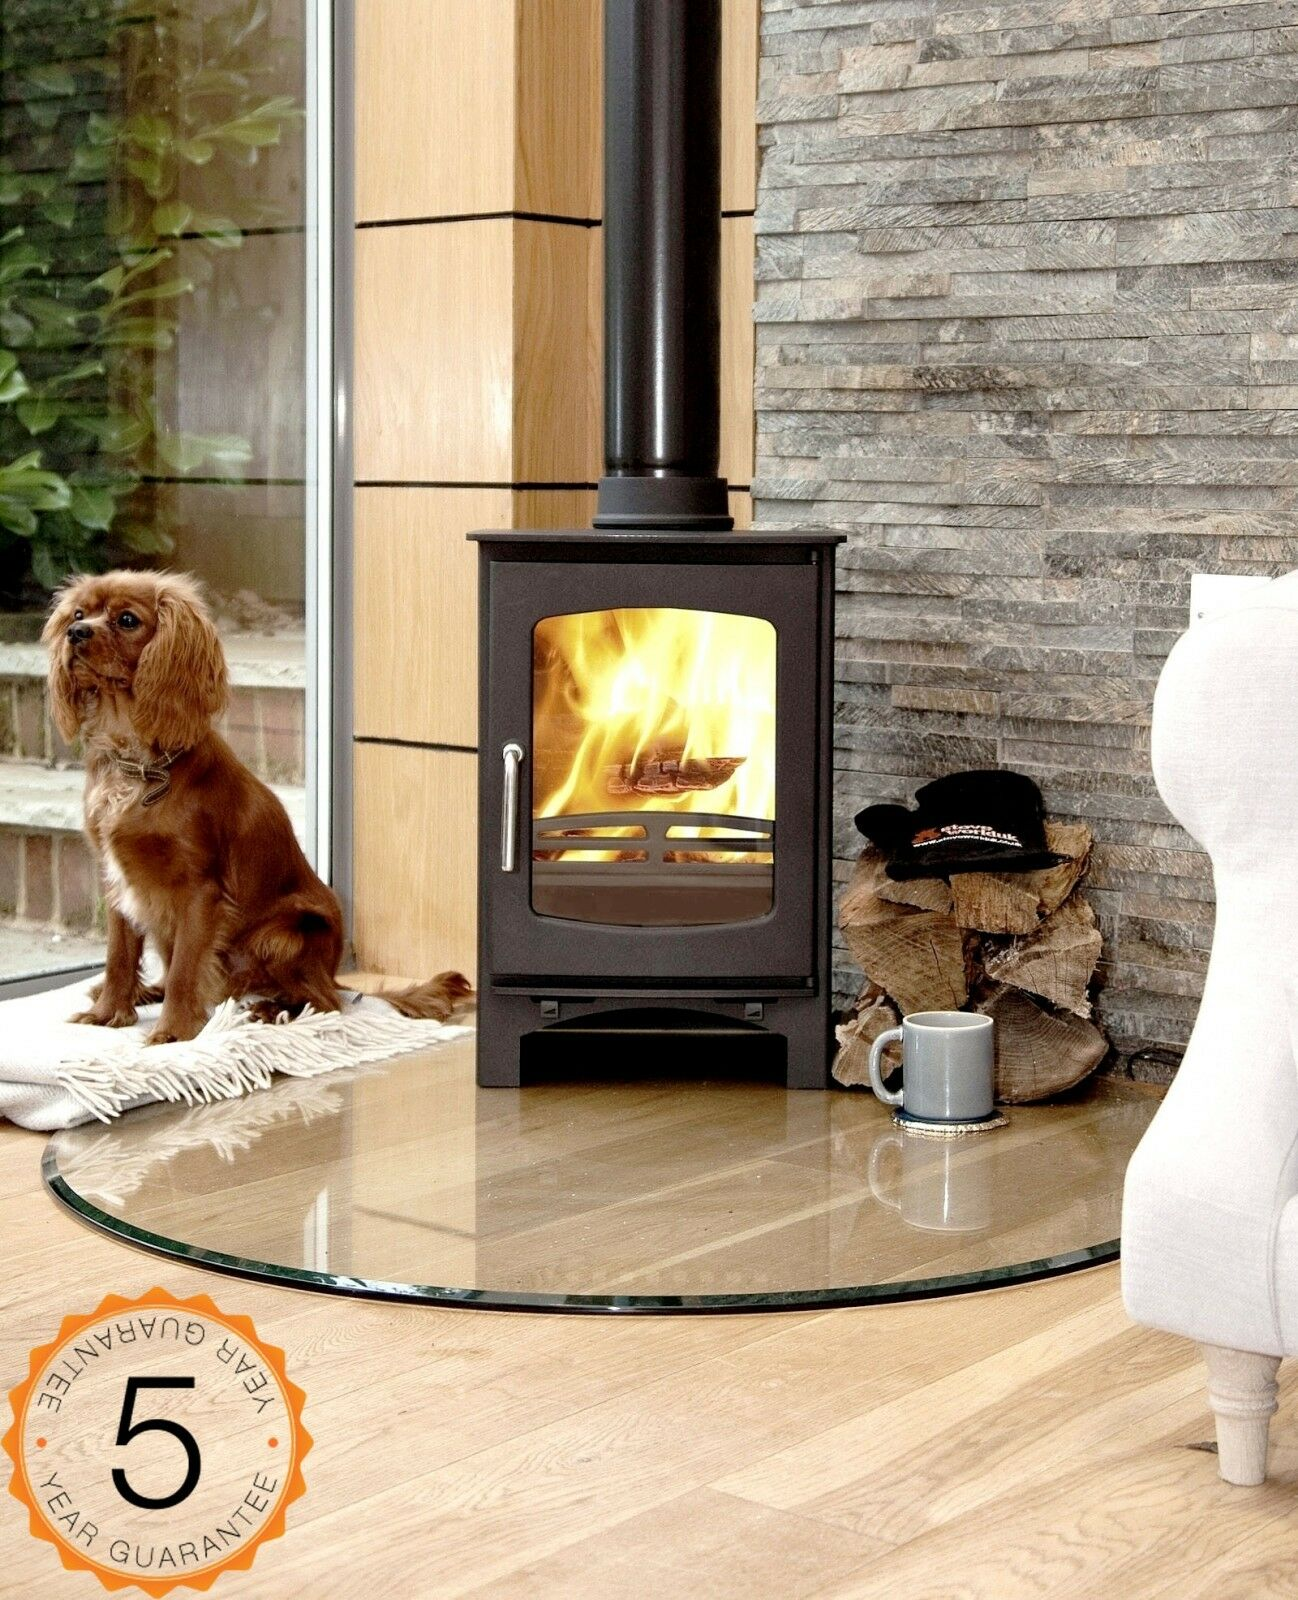 85 Efficent Purefire 5kw Curve Multi Fuel Woodburning